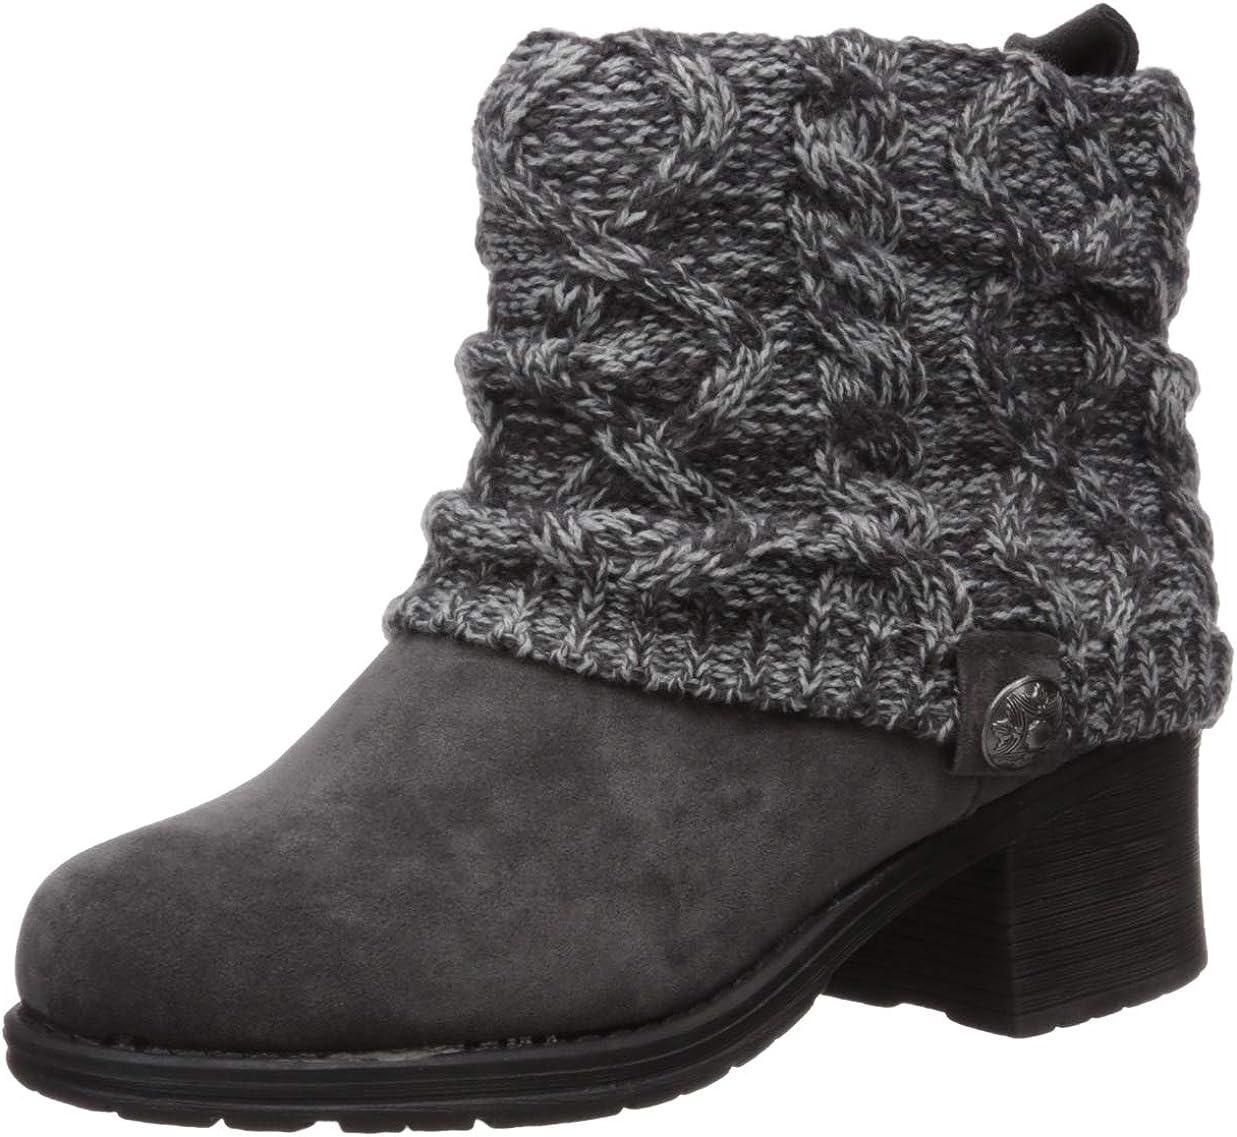 MUK LUKS Women's Haley Boots Ankle